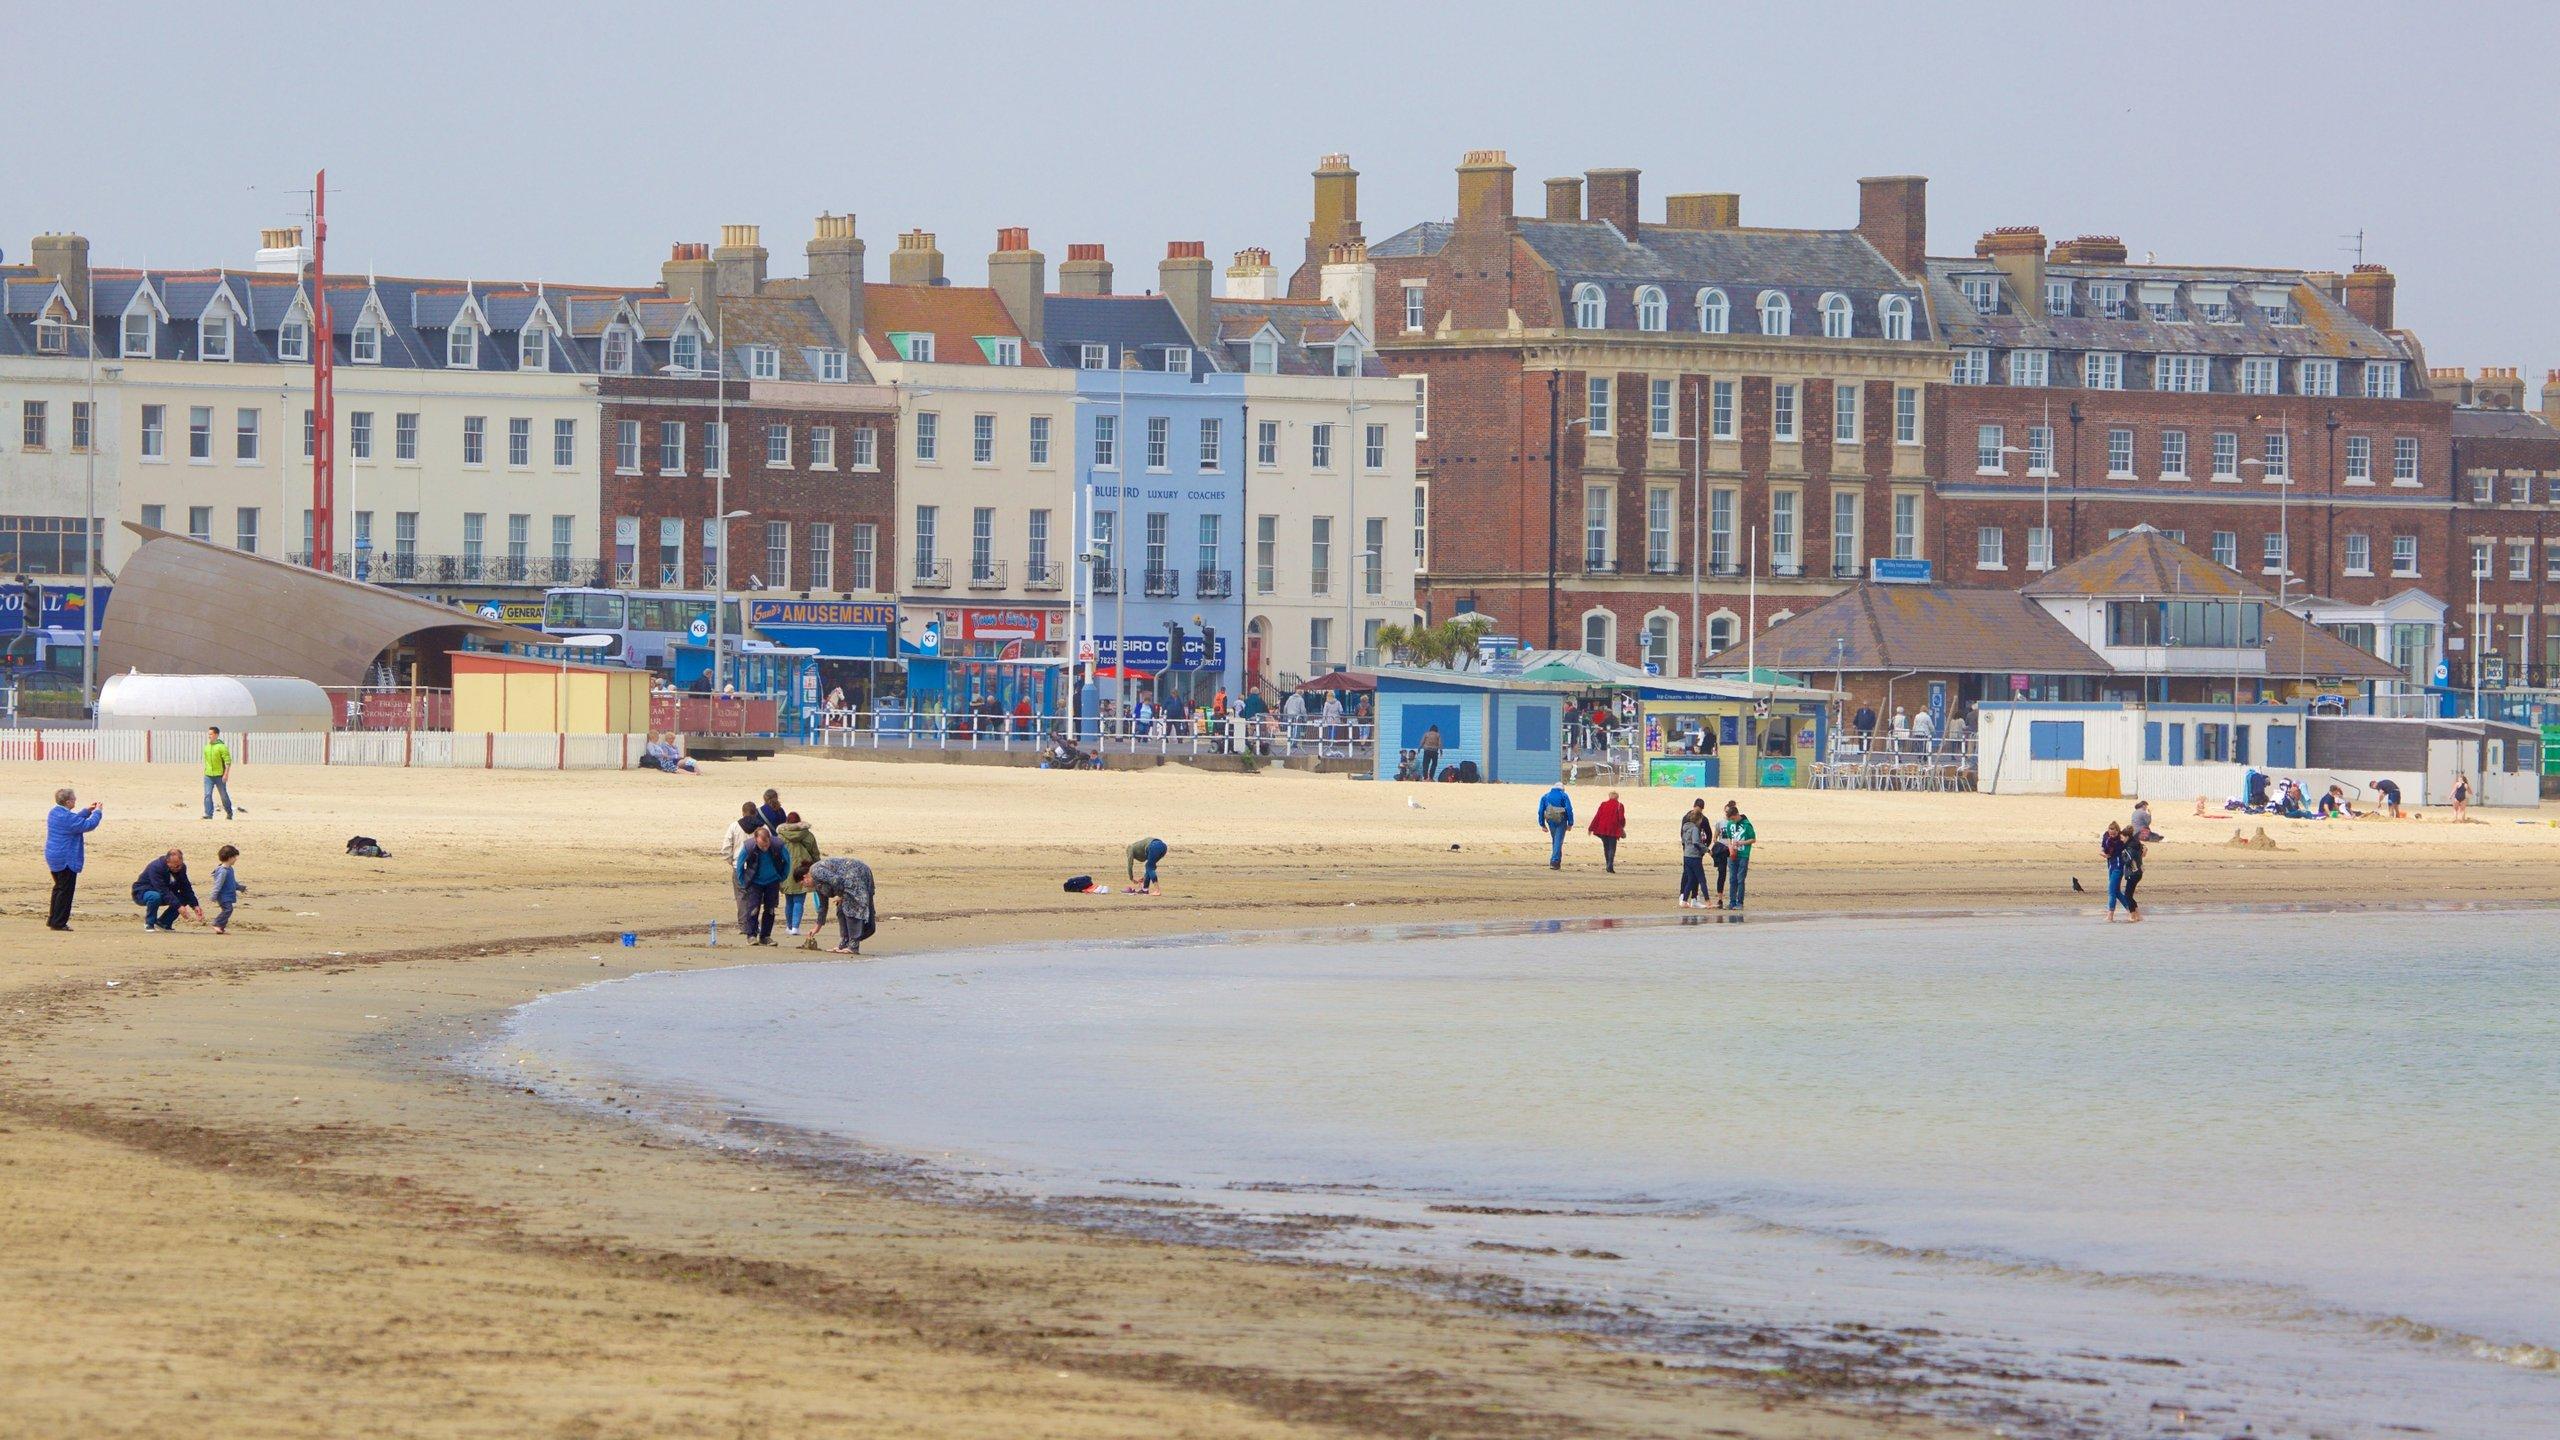 Weymouth, England, United Kingdom